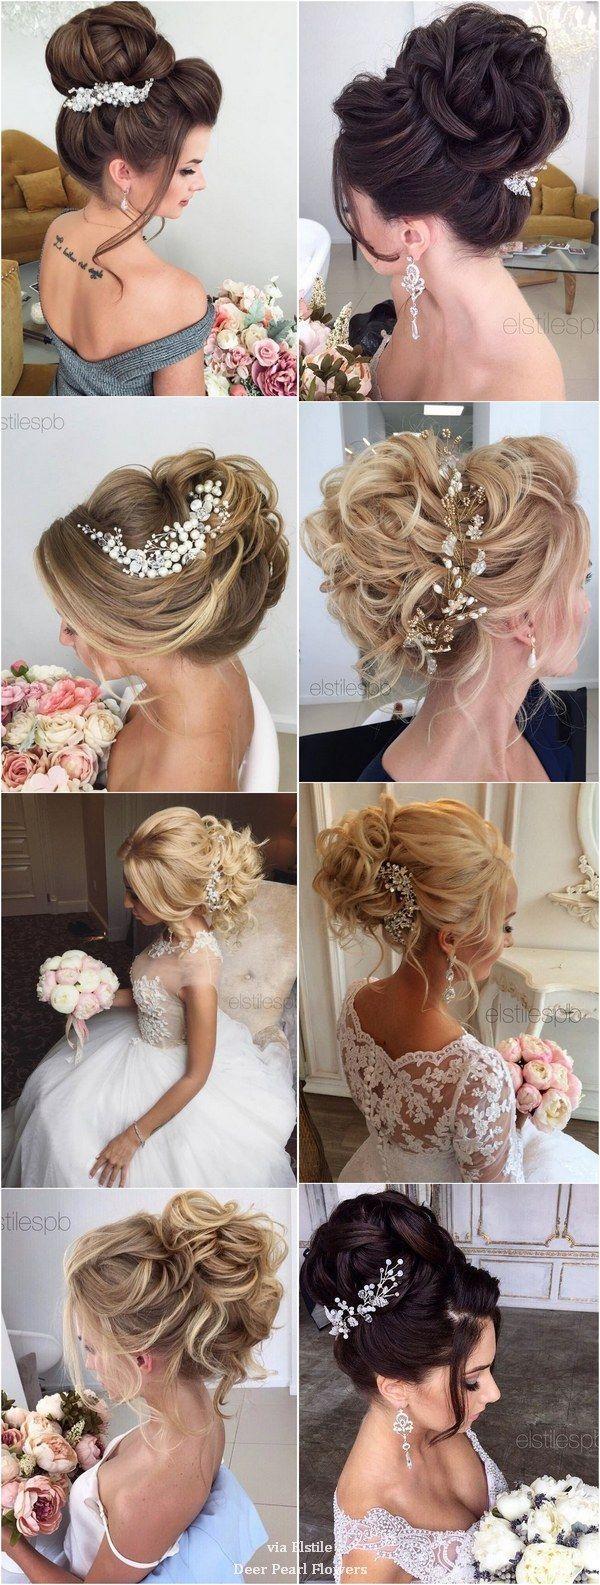 40 Best Wedding Hairstyles For Long Hair / http://www.deerpearlflowers.com/wedding-hairstyles-for-long-hair/